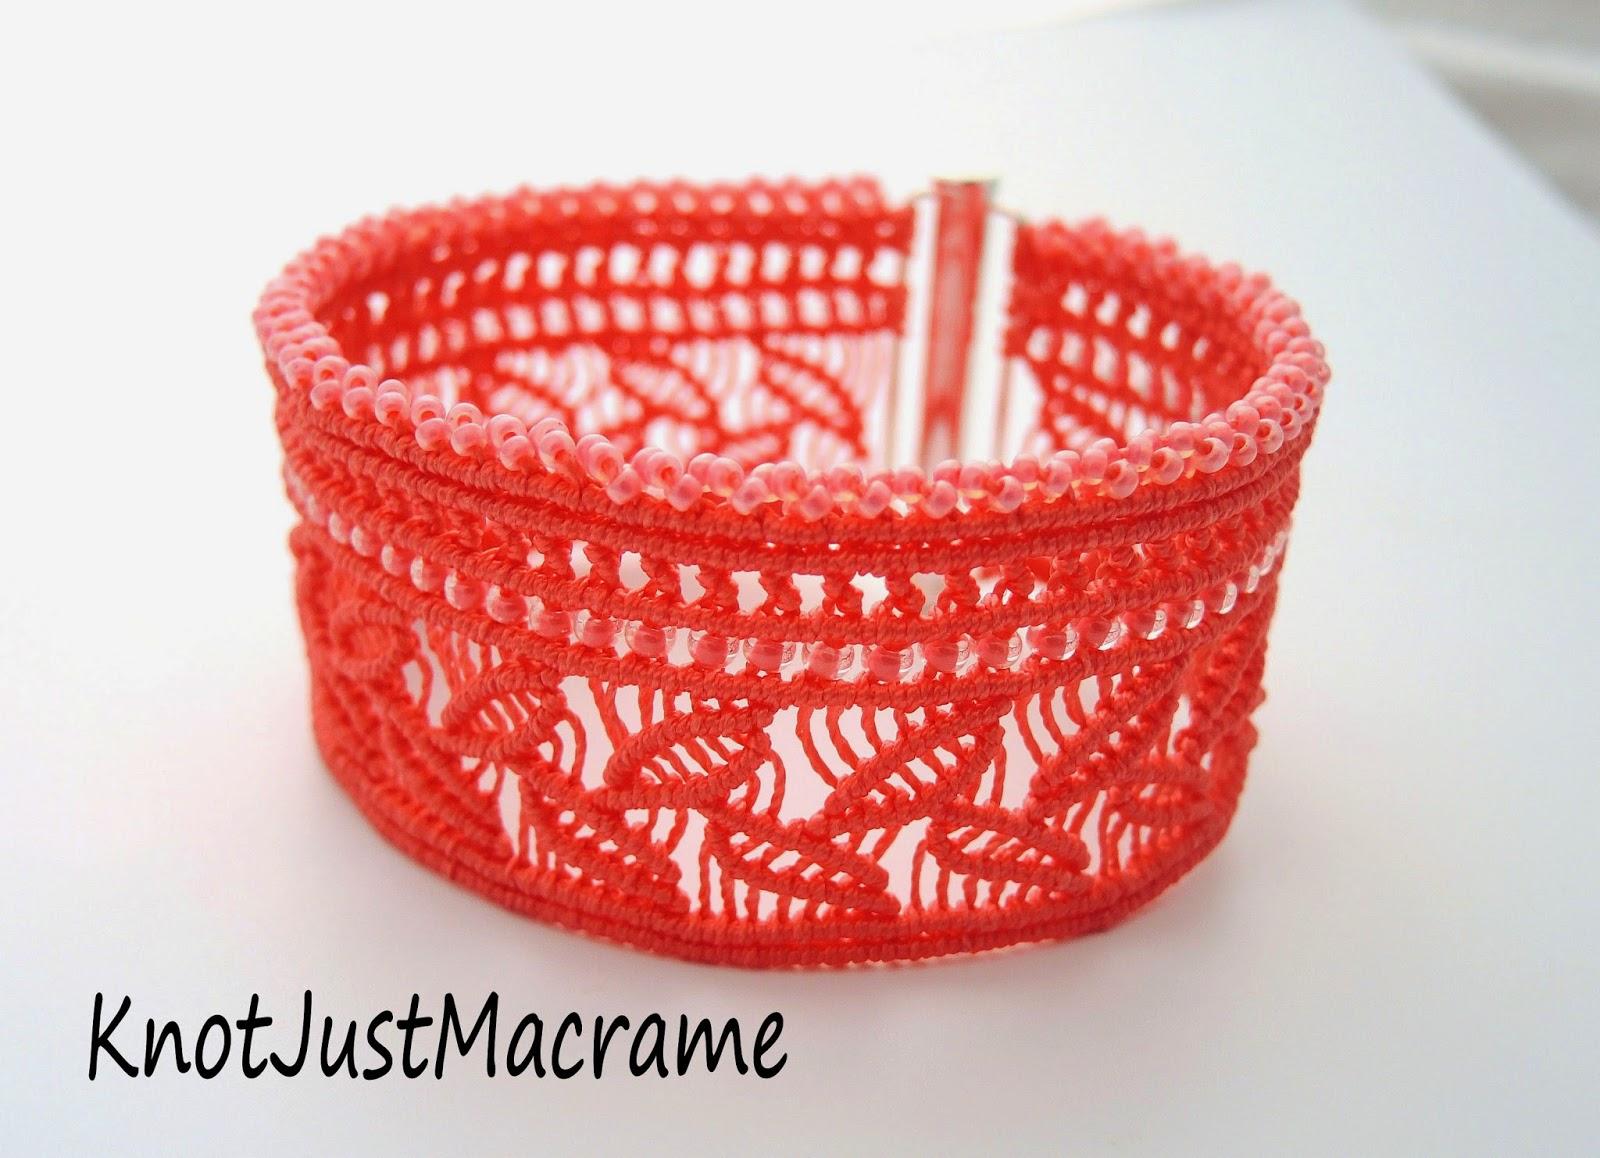 Micro macrame cuff bracelet knotted by Sherri Stokey of Knot Just Macrame.